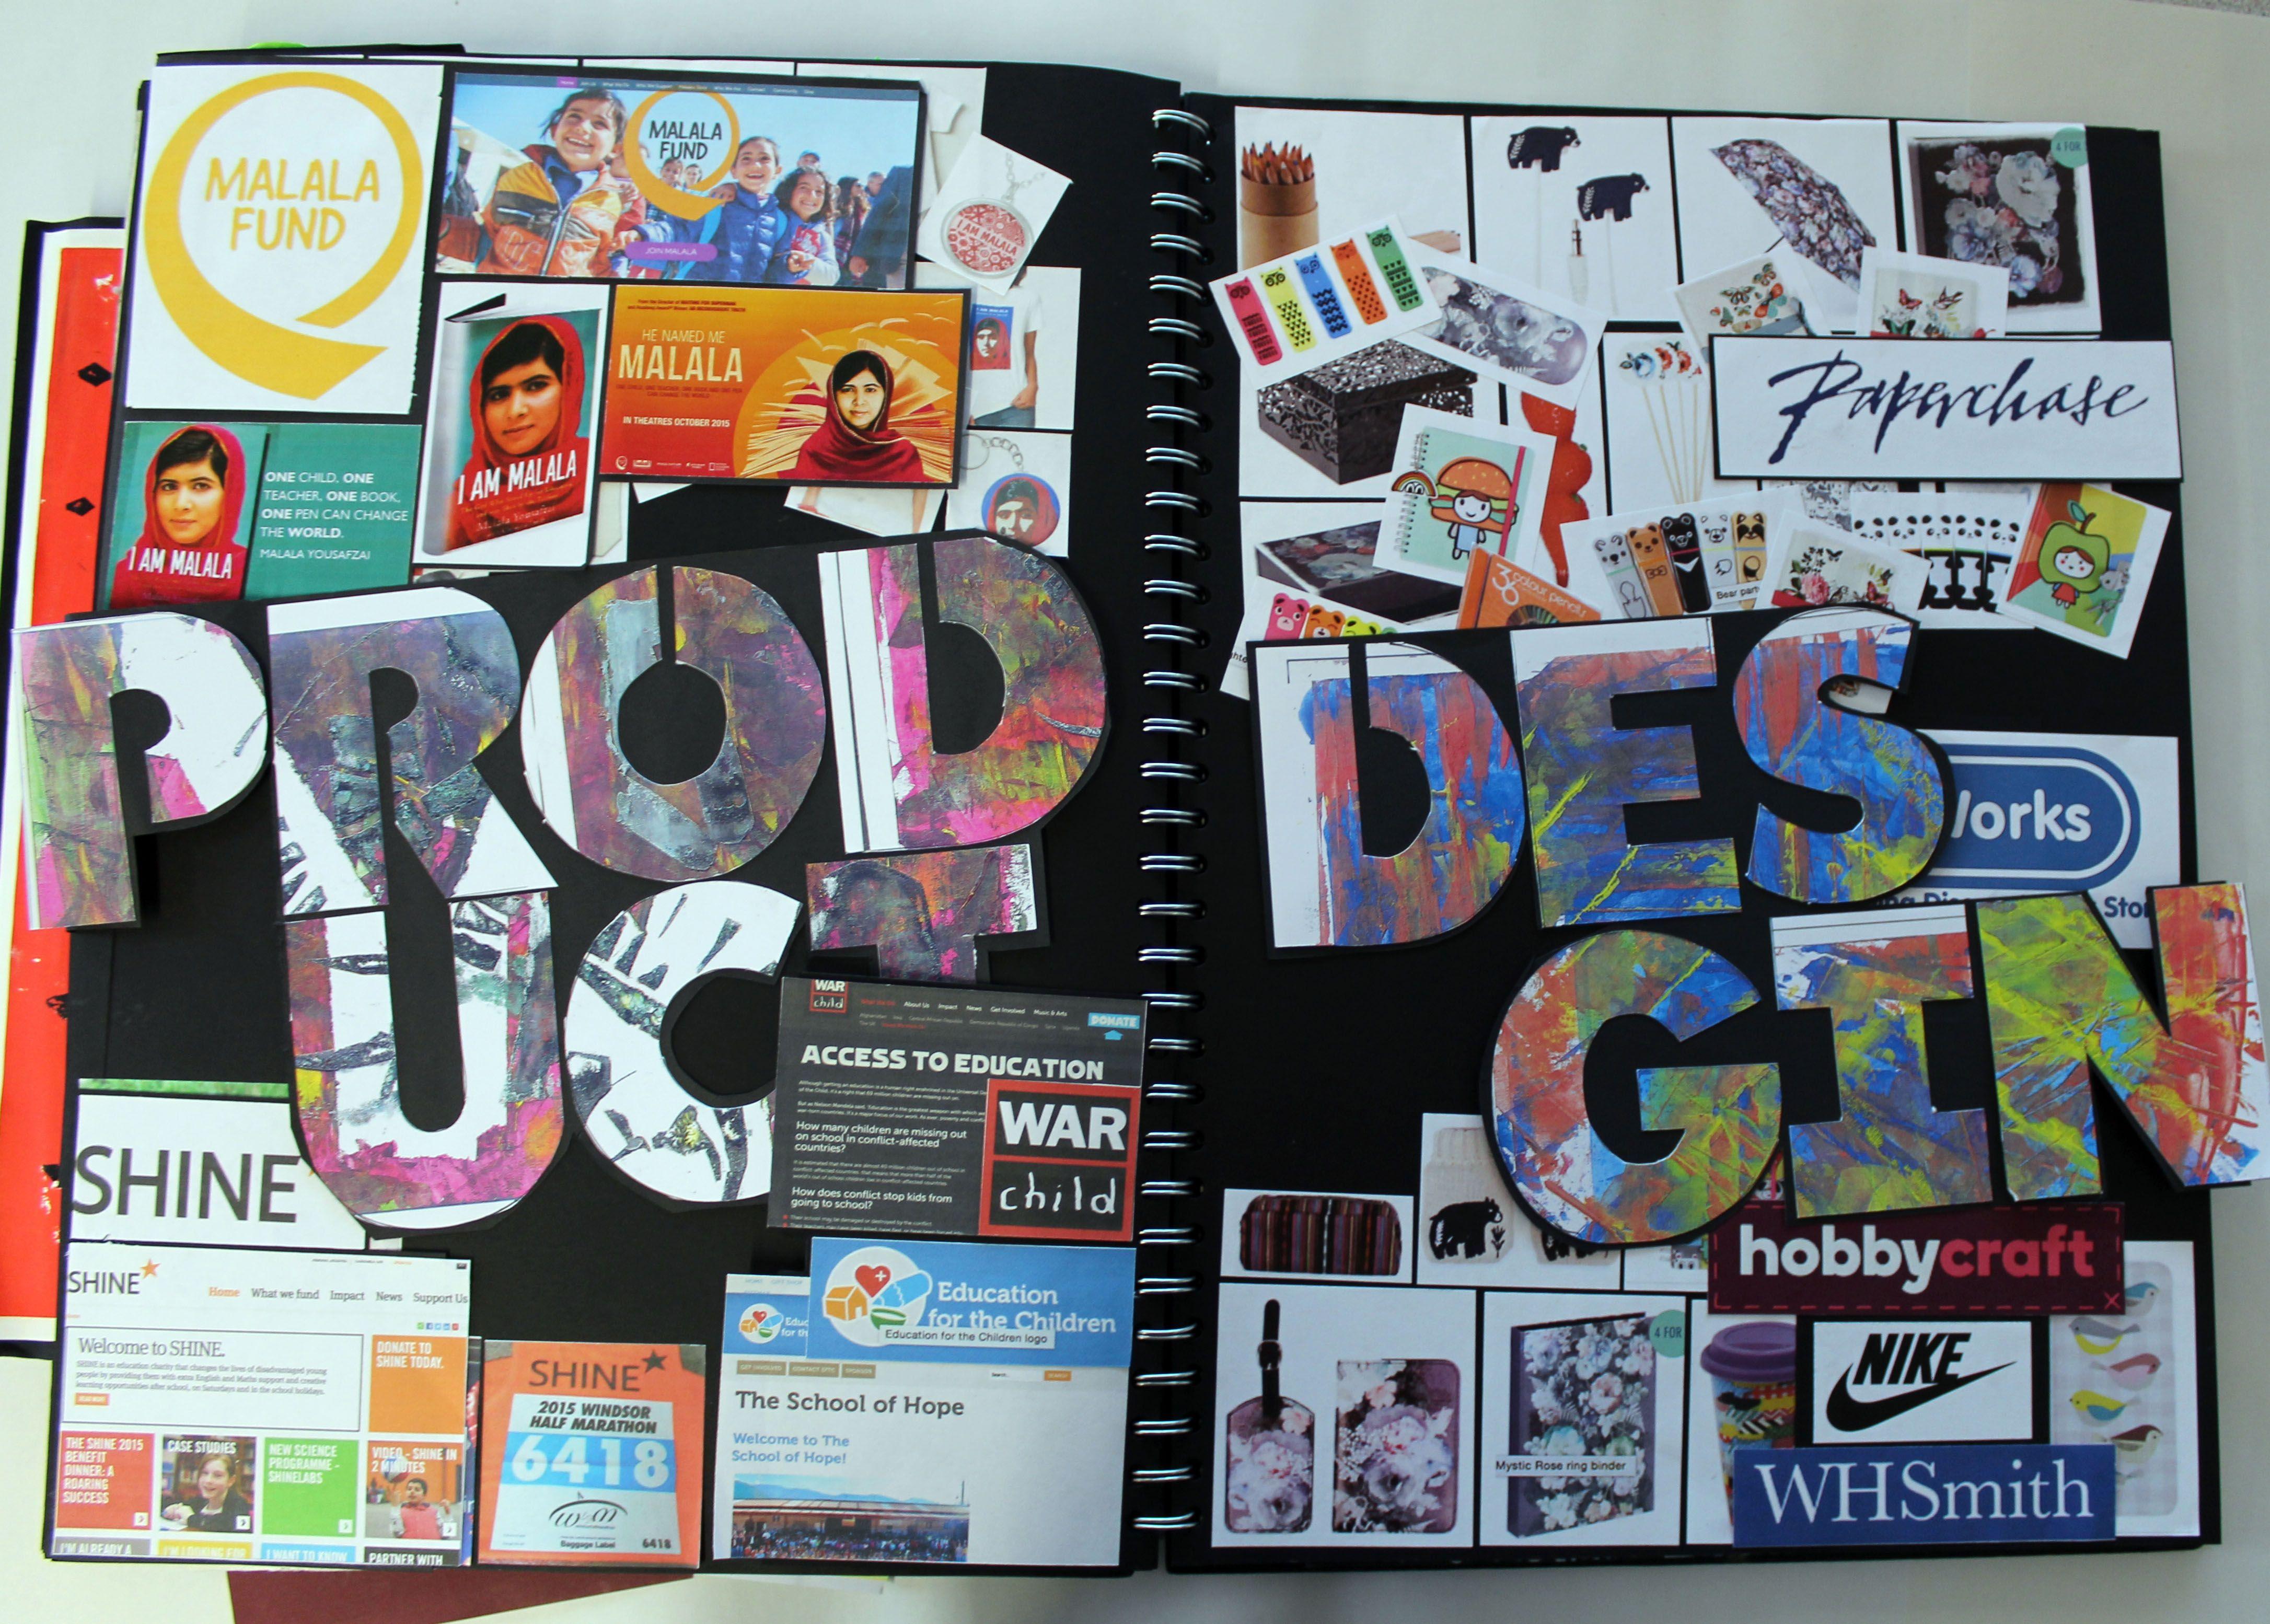 Al Graphic Communication A3 Black Sketchbook Design Research Cswk Structures Thomas Rotherham College 2015 16 Sketch Book Sketchbook Layout Mind Map Art